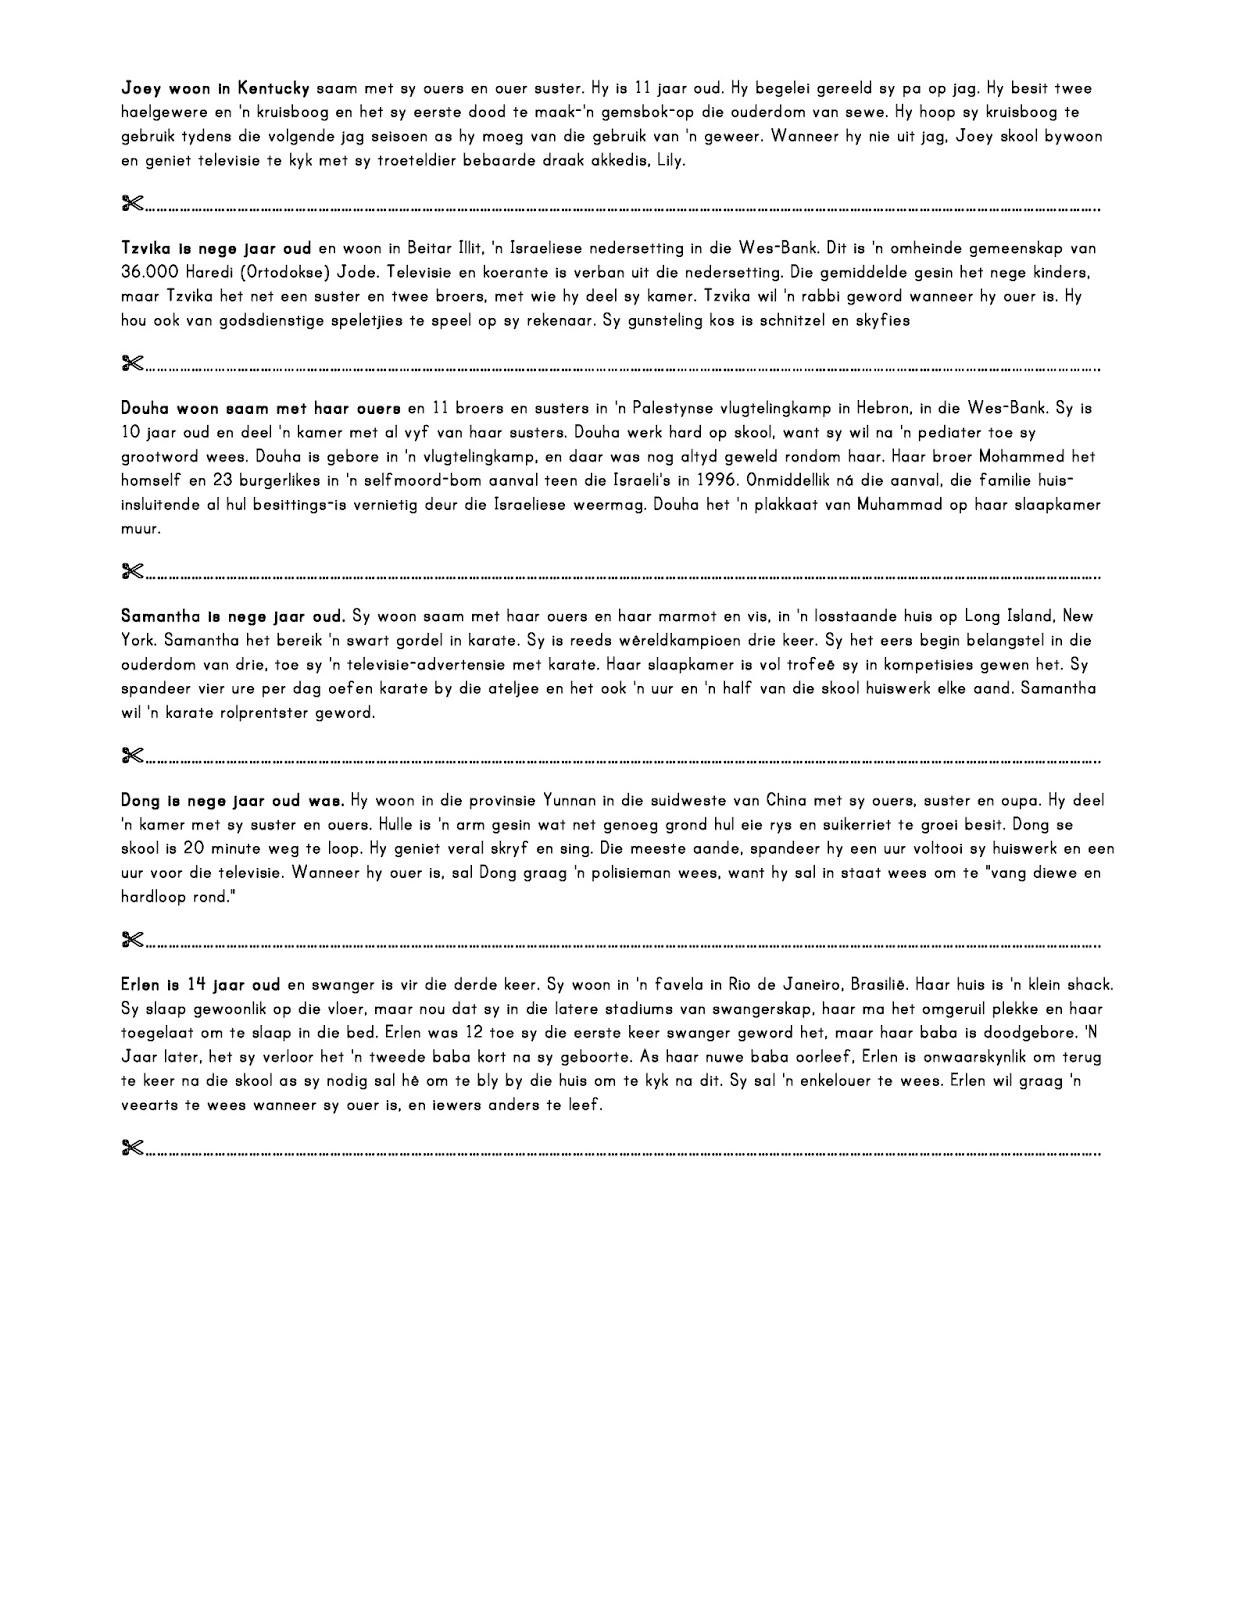 002 My Most Influential Teacher Essay Fascinating Full